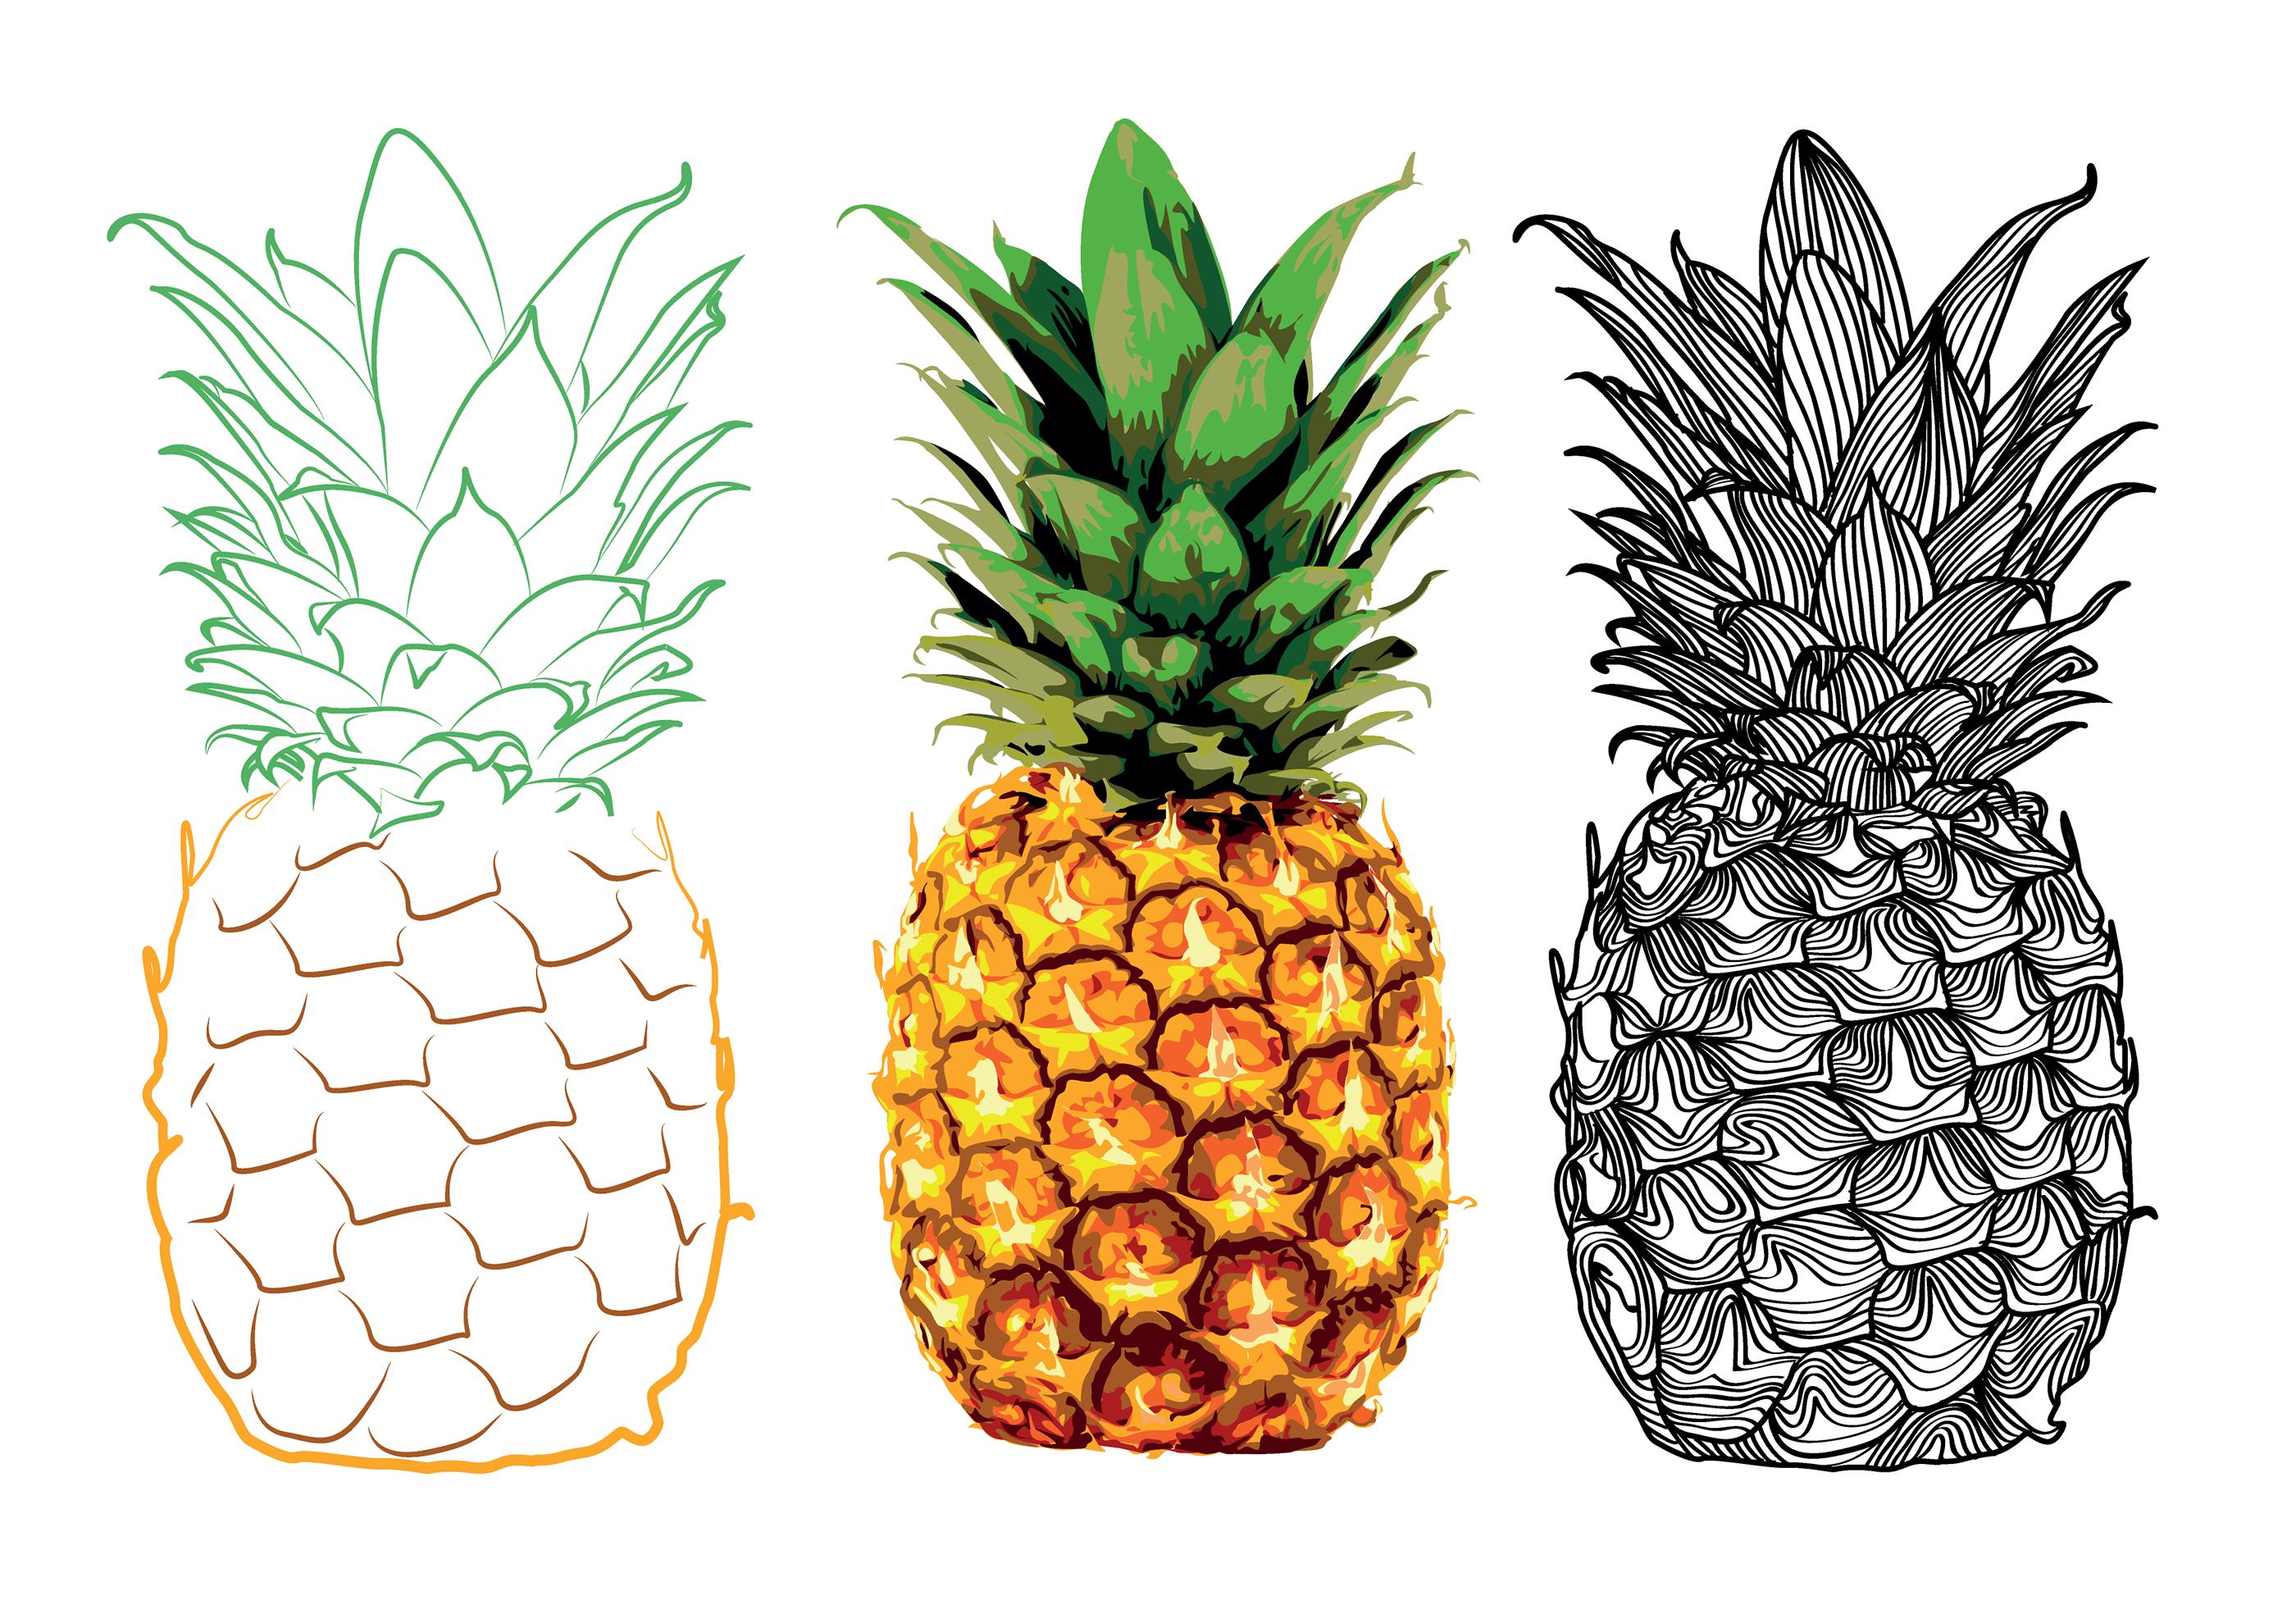 Картинки нарисованного ананаса